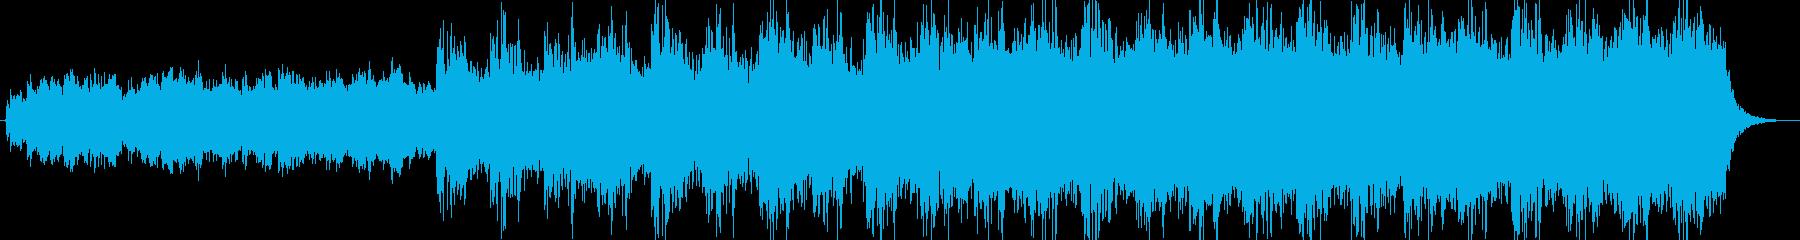 Horror Orchestraの再生済みの波形